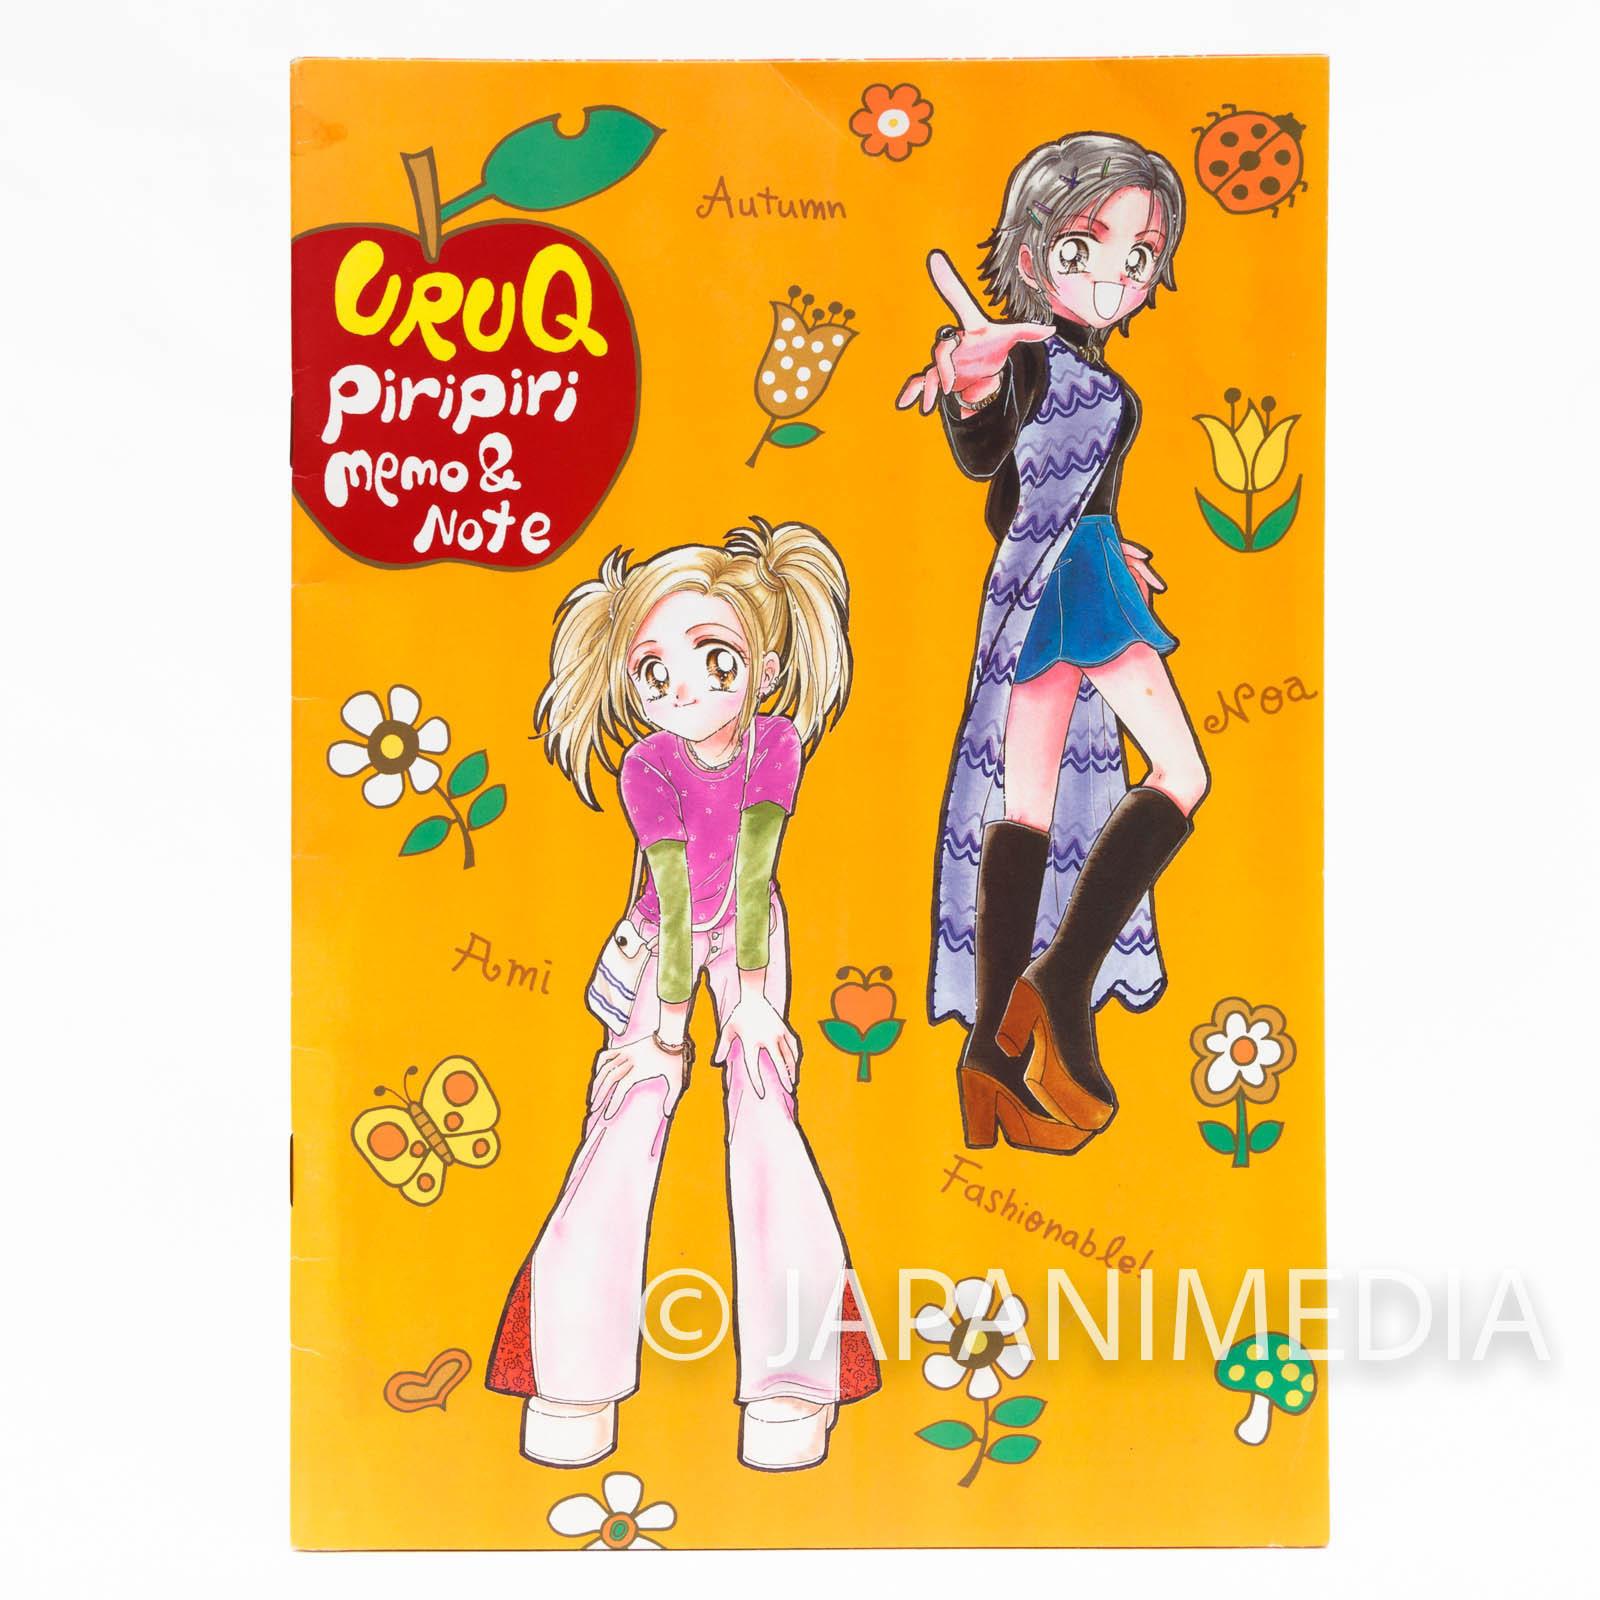 Ultra Cute Pri Pri Memo & Notebook Nami Akimoto NAKAYOSHI 1999 JAPAN MANGA